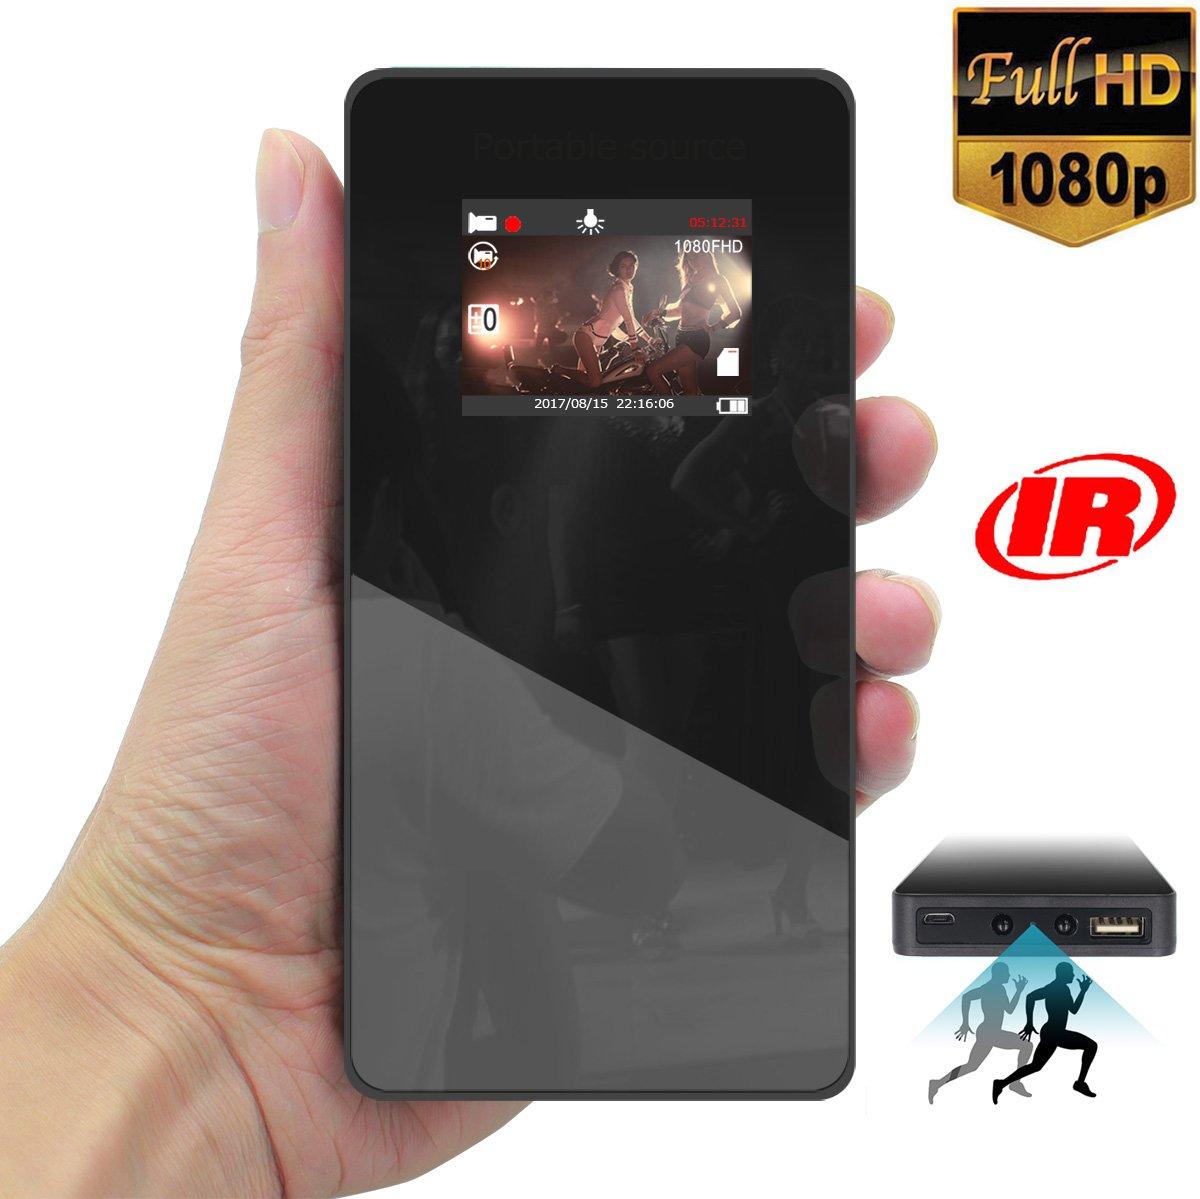 SeiTang 1080P HD高画質 モバイルバッテリー型カメラ スマホ型隠しカメラ スパイカメラ 動画撮影動体検知機能赤外線ライト暗視機能付き 2.0インチカラー液晶モニターを搭載 モバイル充電器機能 B01NCOX83Z  黑